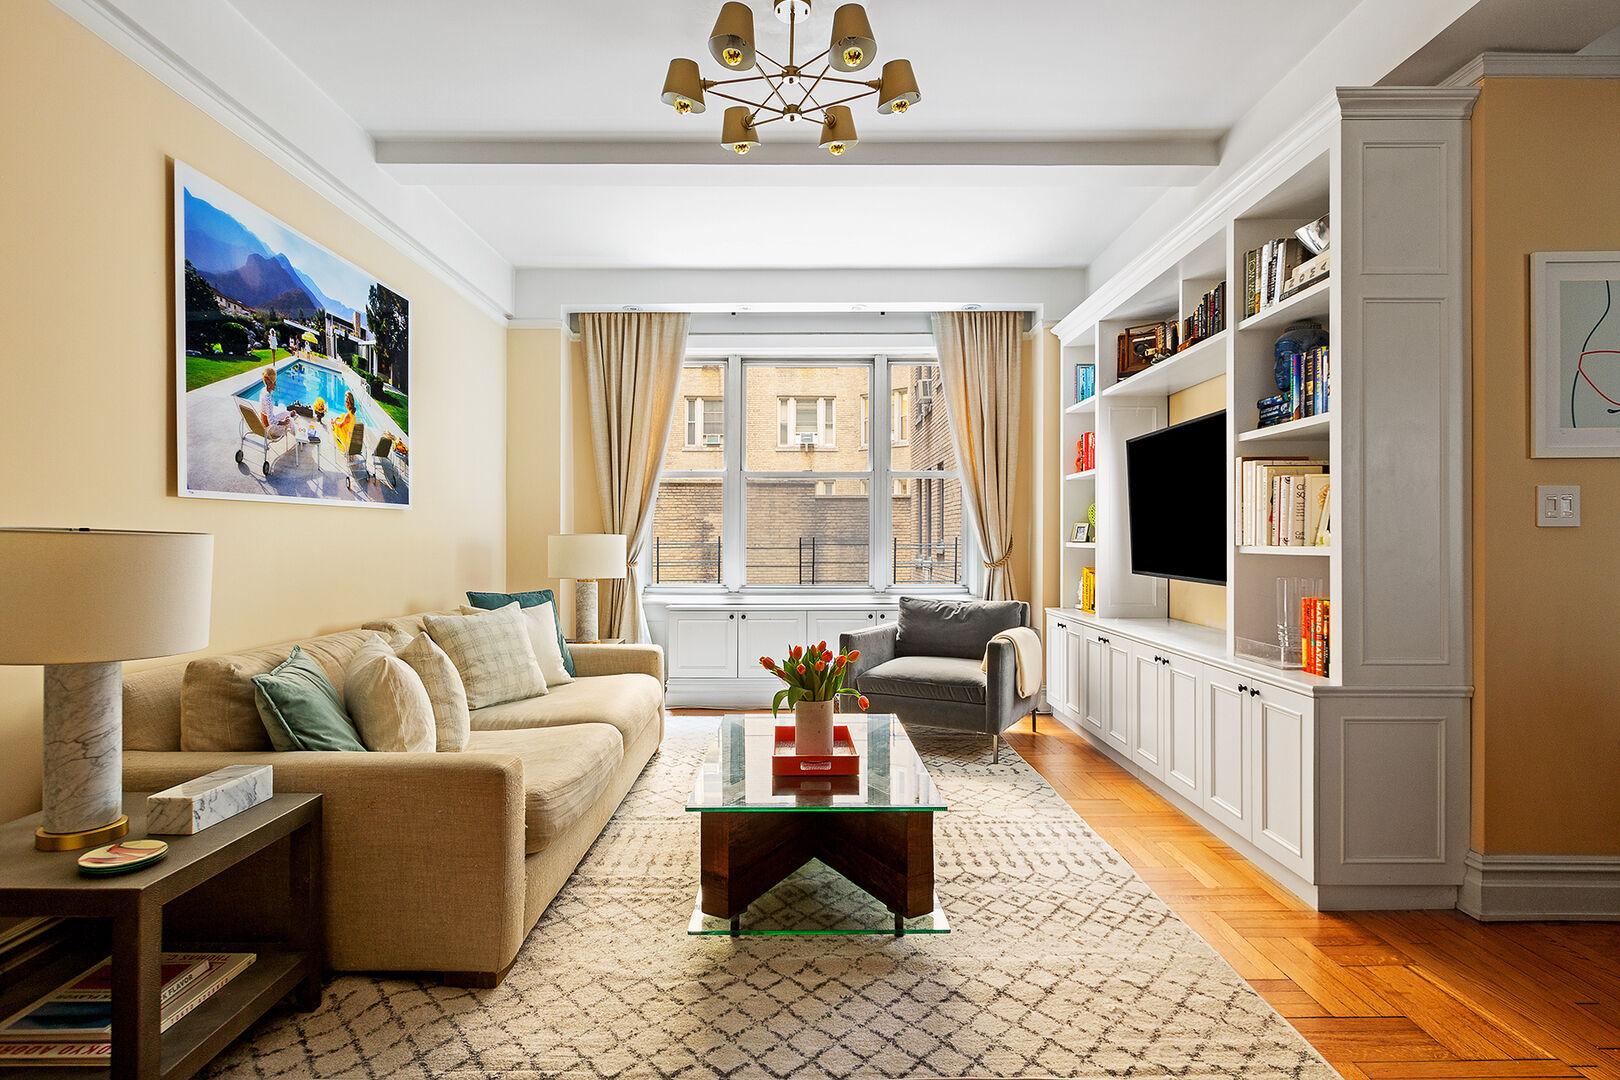 Apartment for sale at 30 Fifth Avenue, Apt 2-E